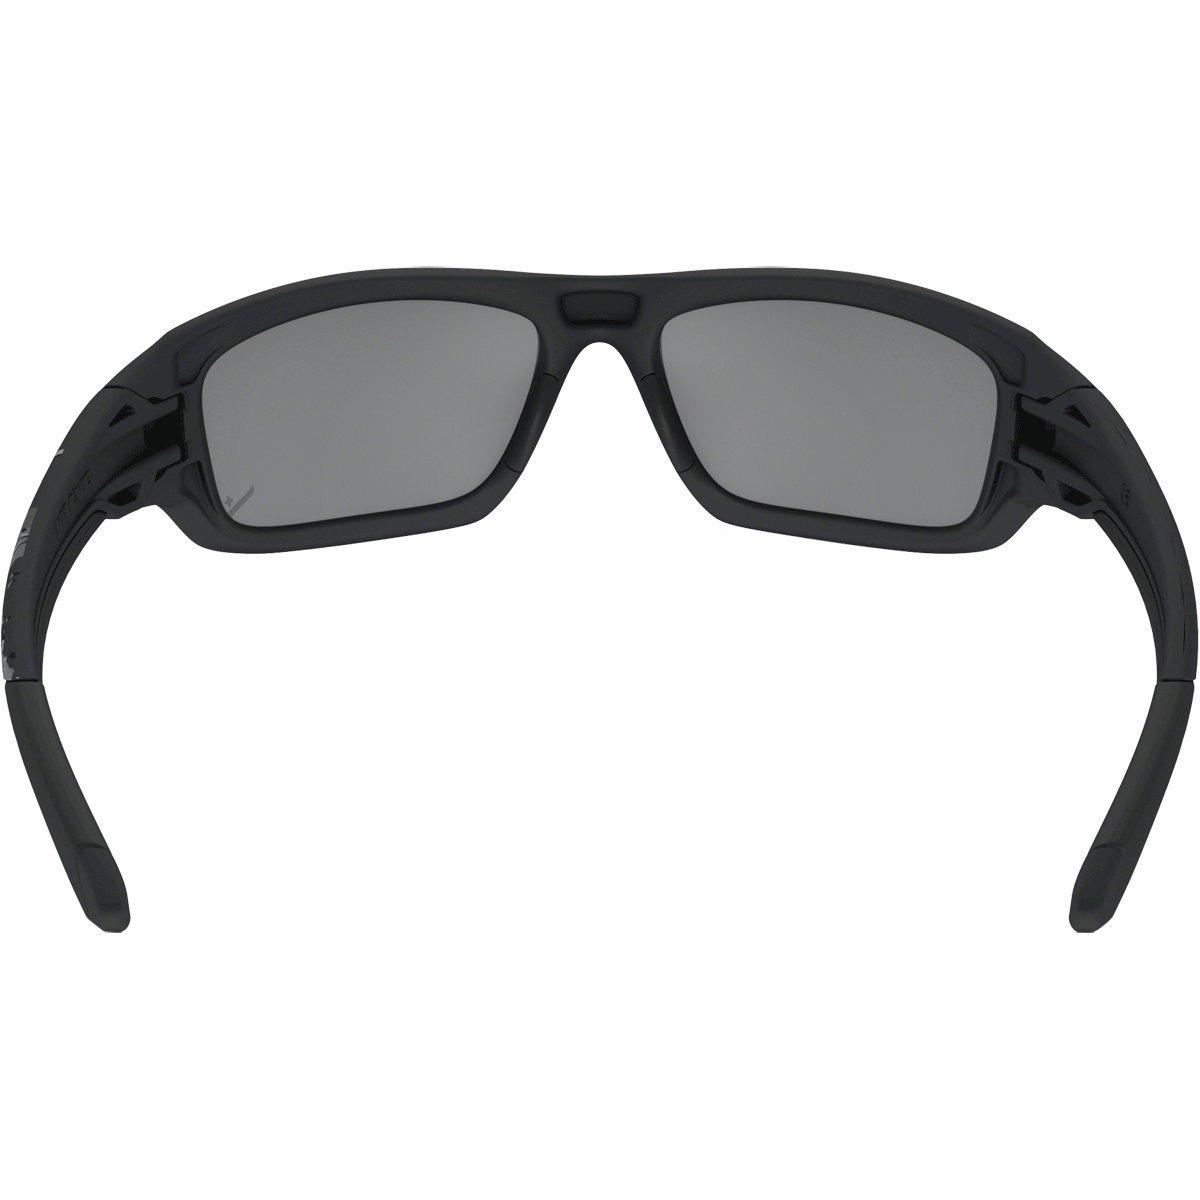 Oakley Men's Valve Rectangular, Carbon, 60 mm by Oakley (Image #3)